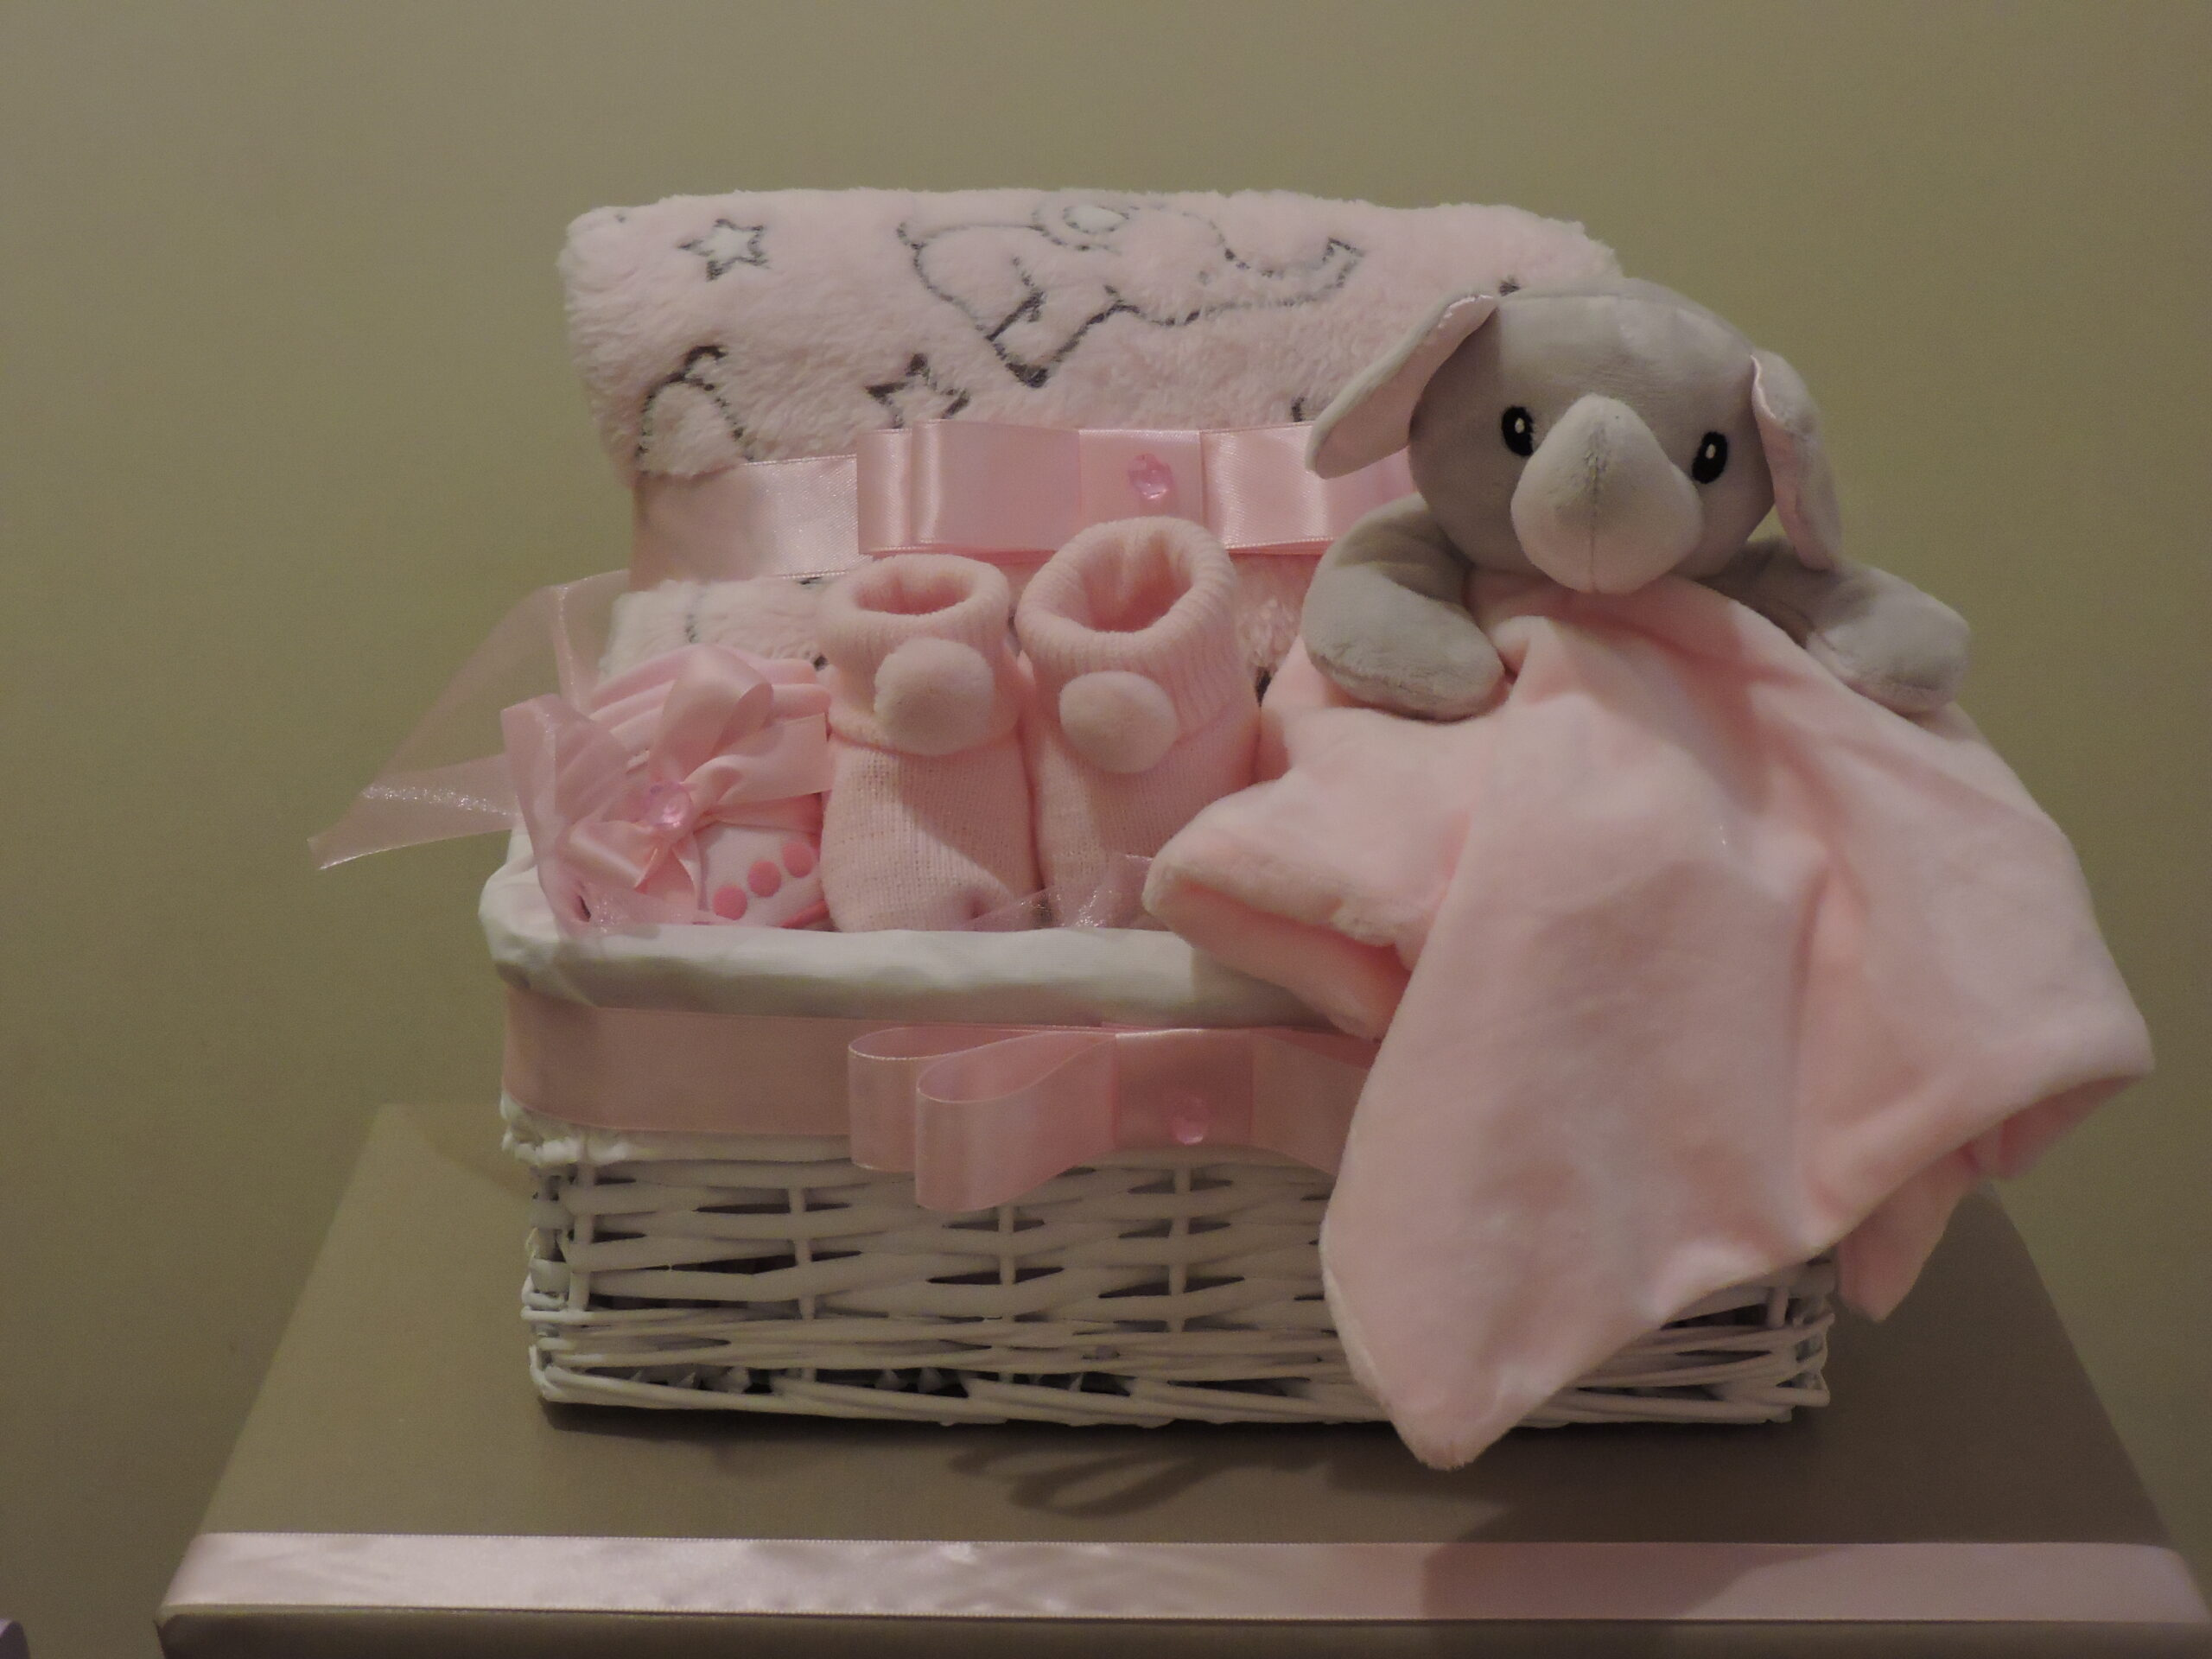 Elephant in a basket